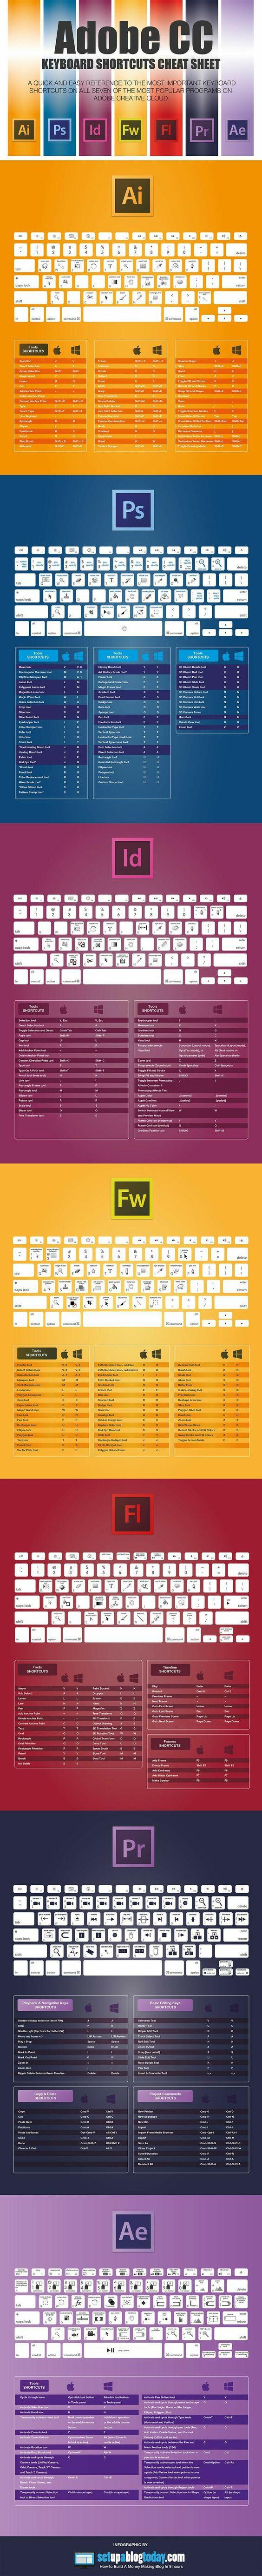 Chart Adobe design